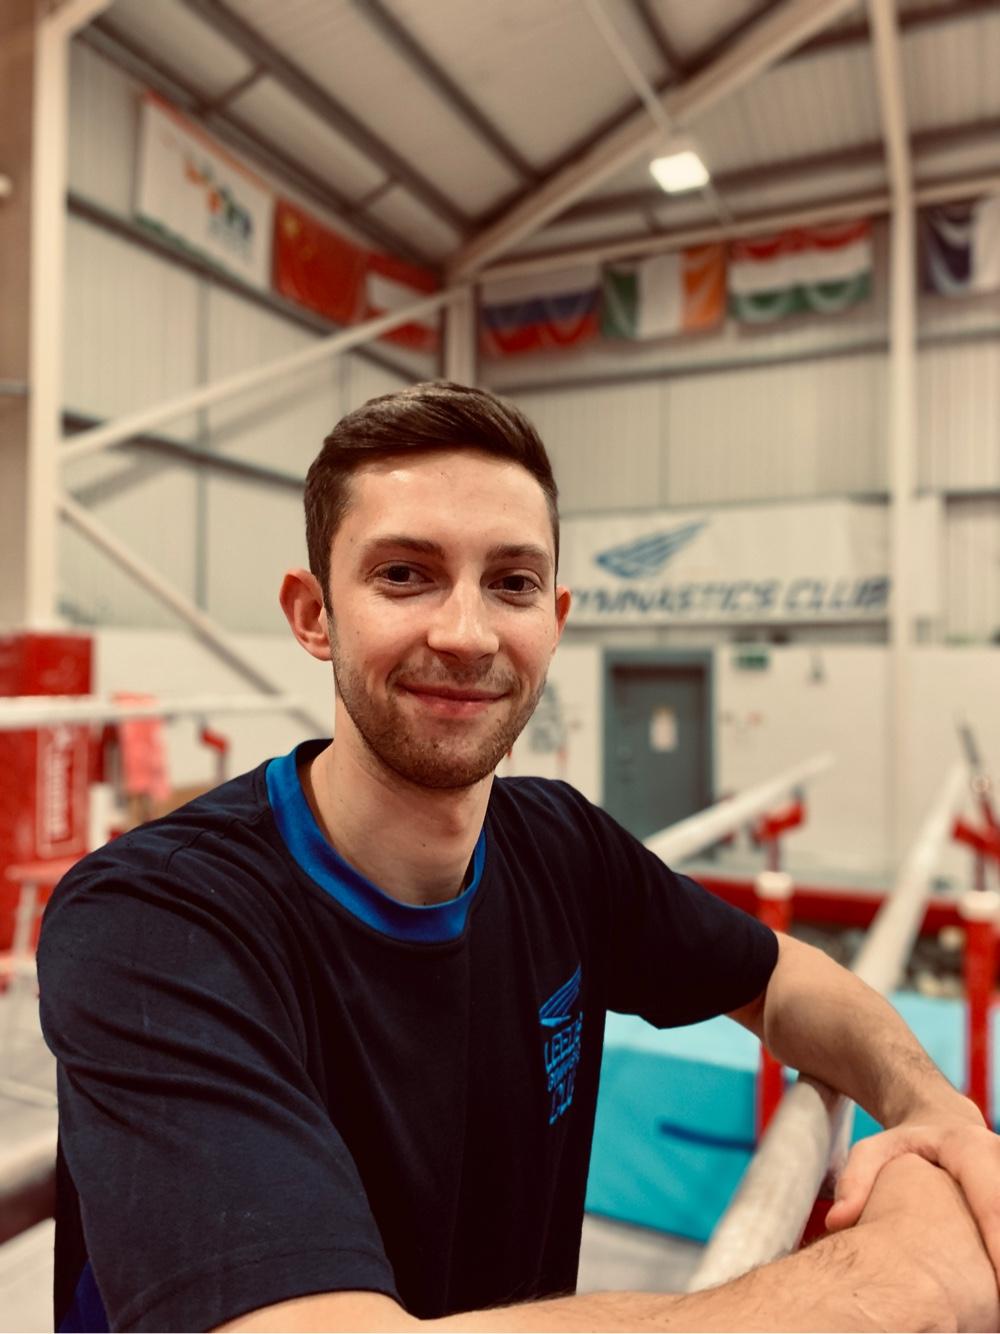 Jaron Morgan Leeds Gymnastics Coach and Personal Trainer